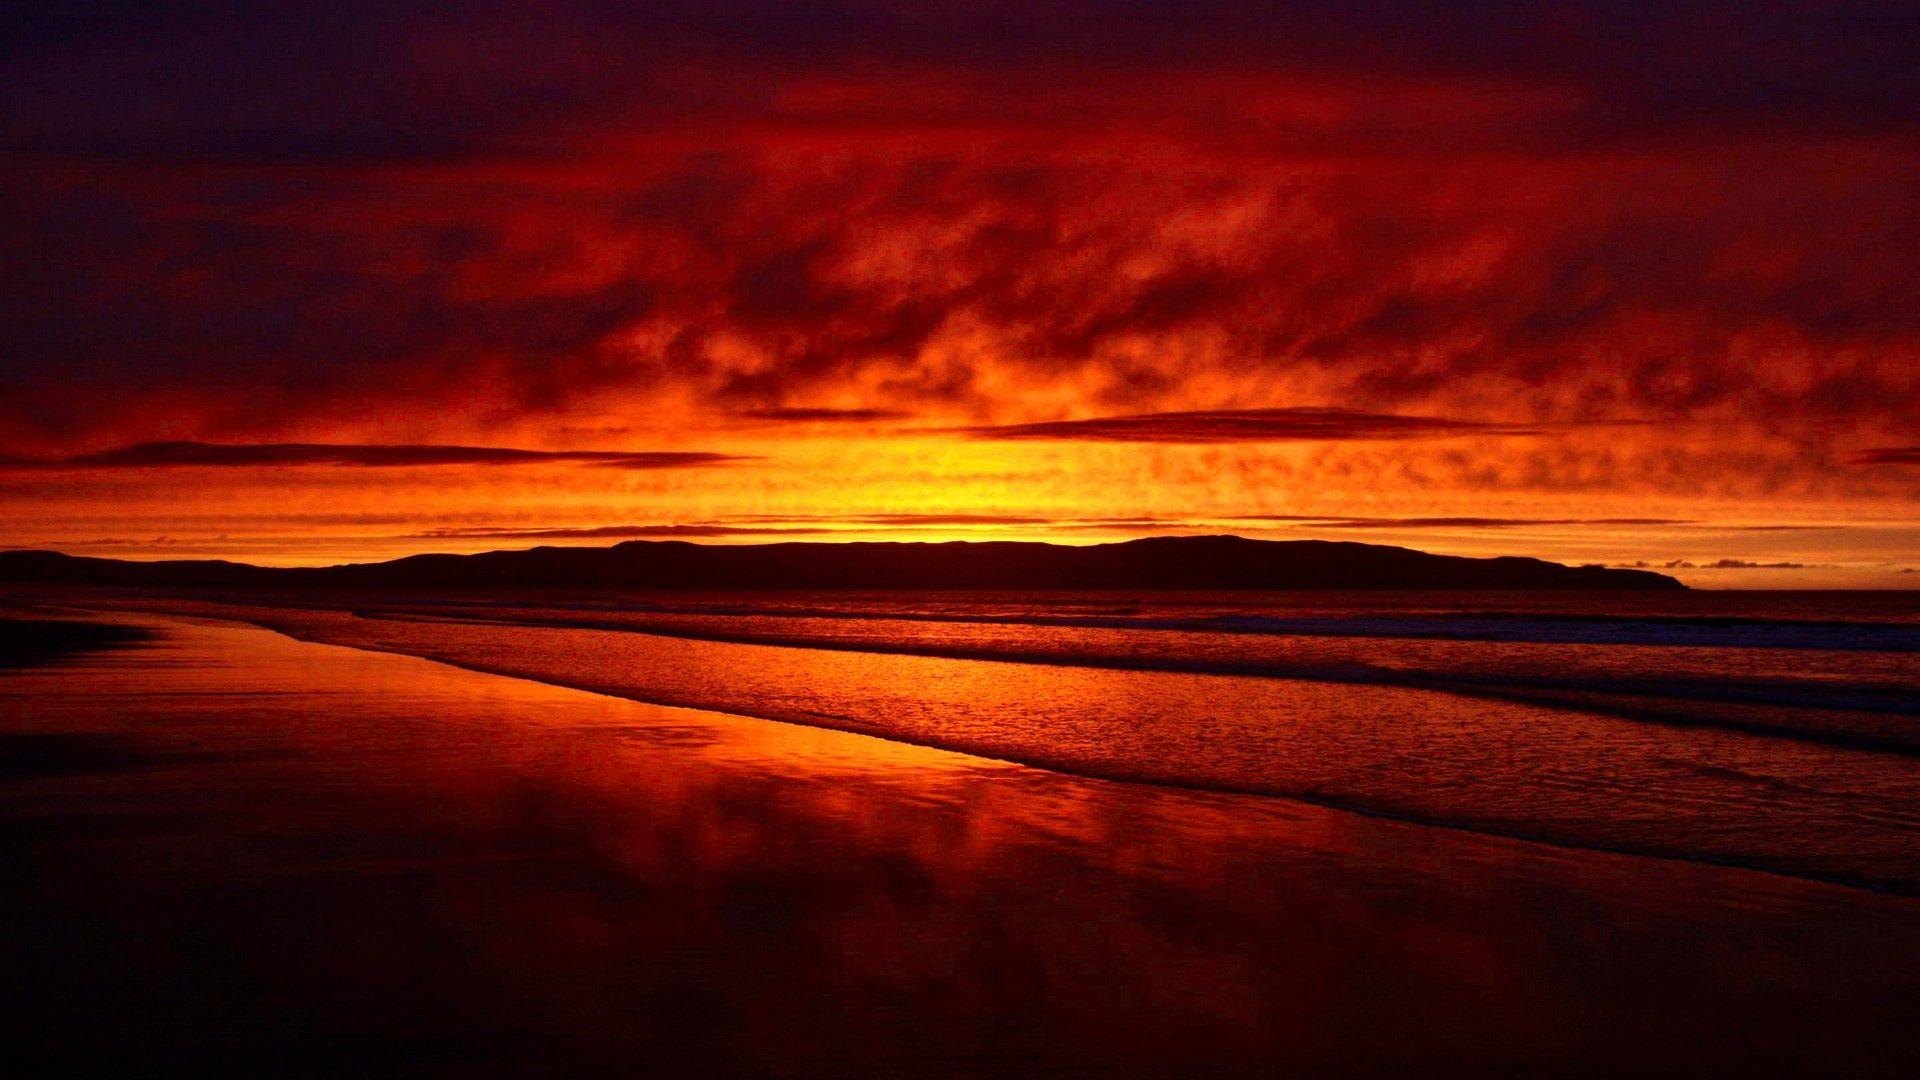 Red Sunset Wallpaper